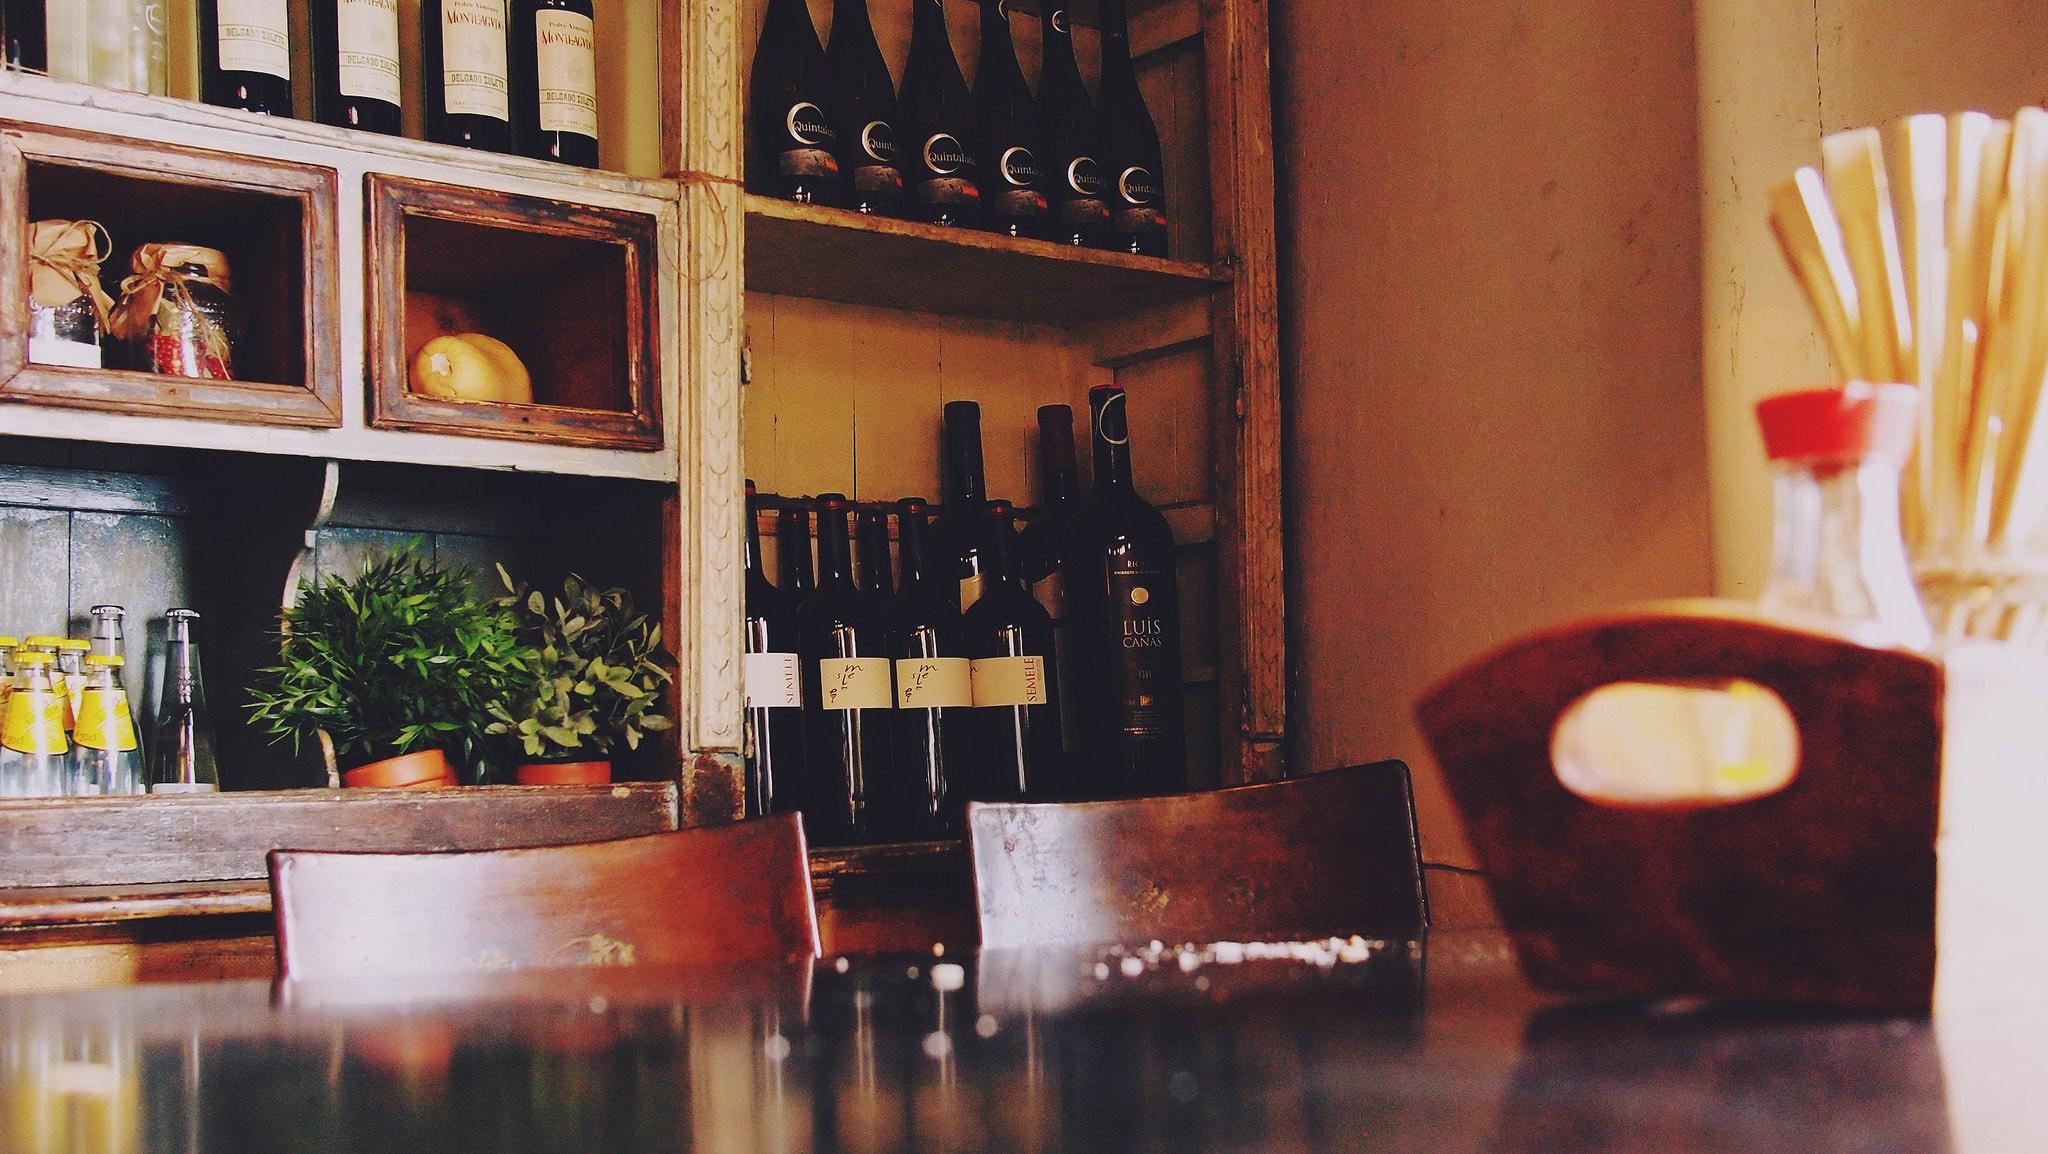 Spanish bar | © Epicantus / Flickr